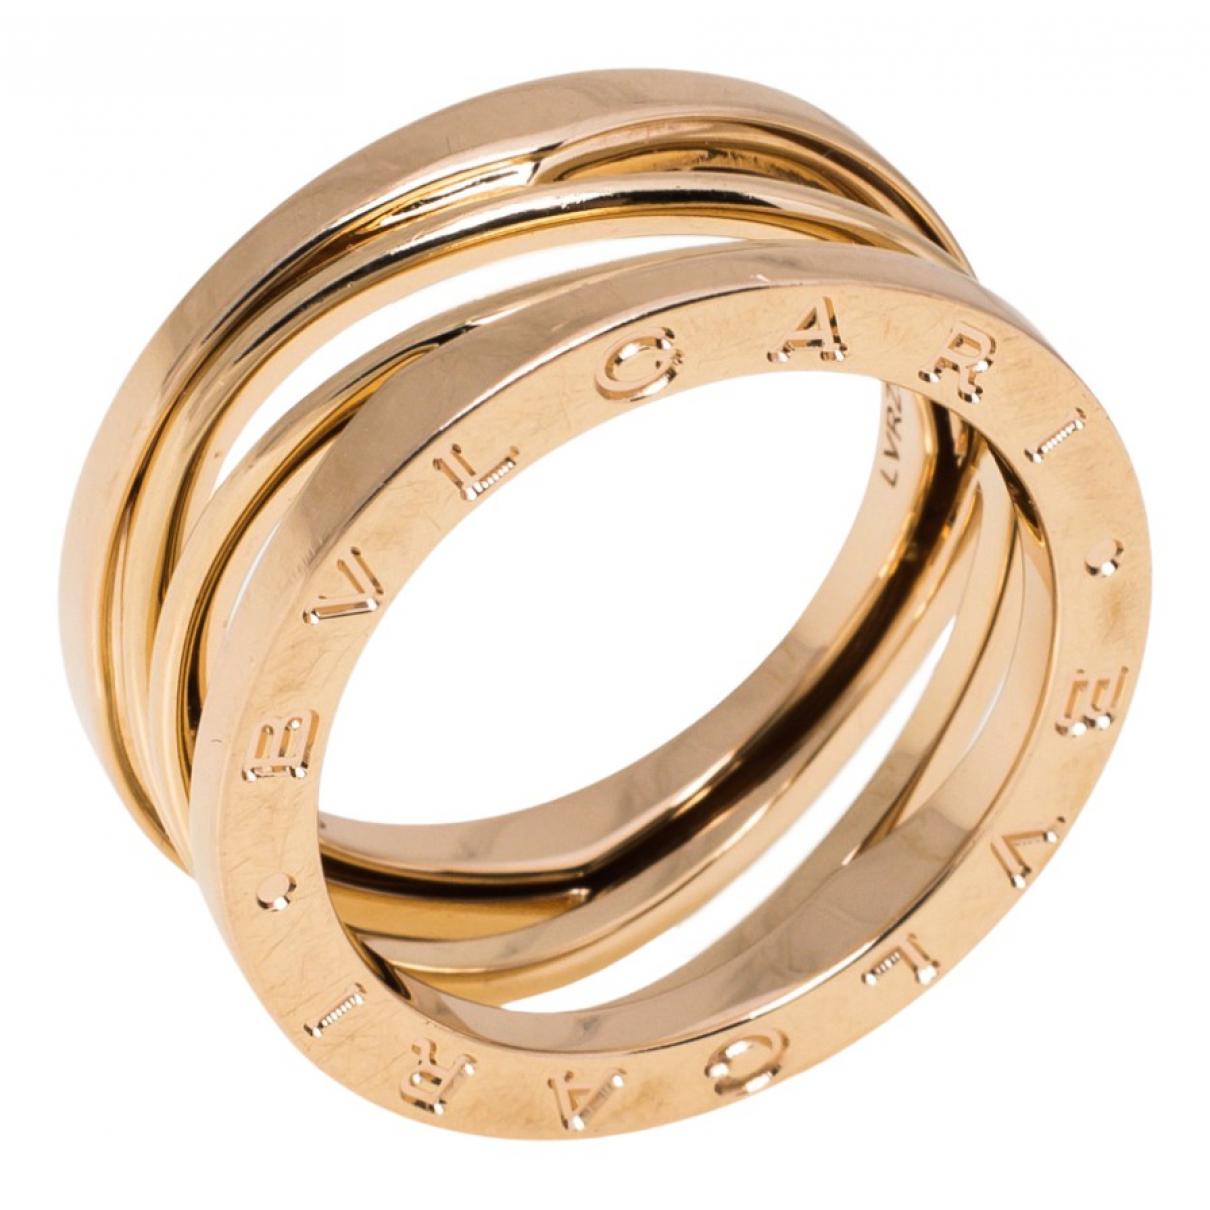 Bvlgari B.Zero1 Pink gold ring for Women 56 EU